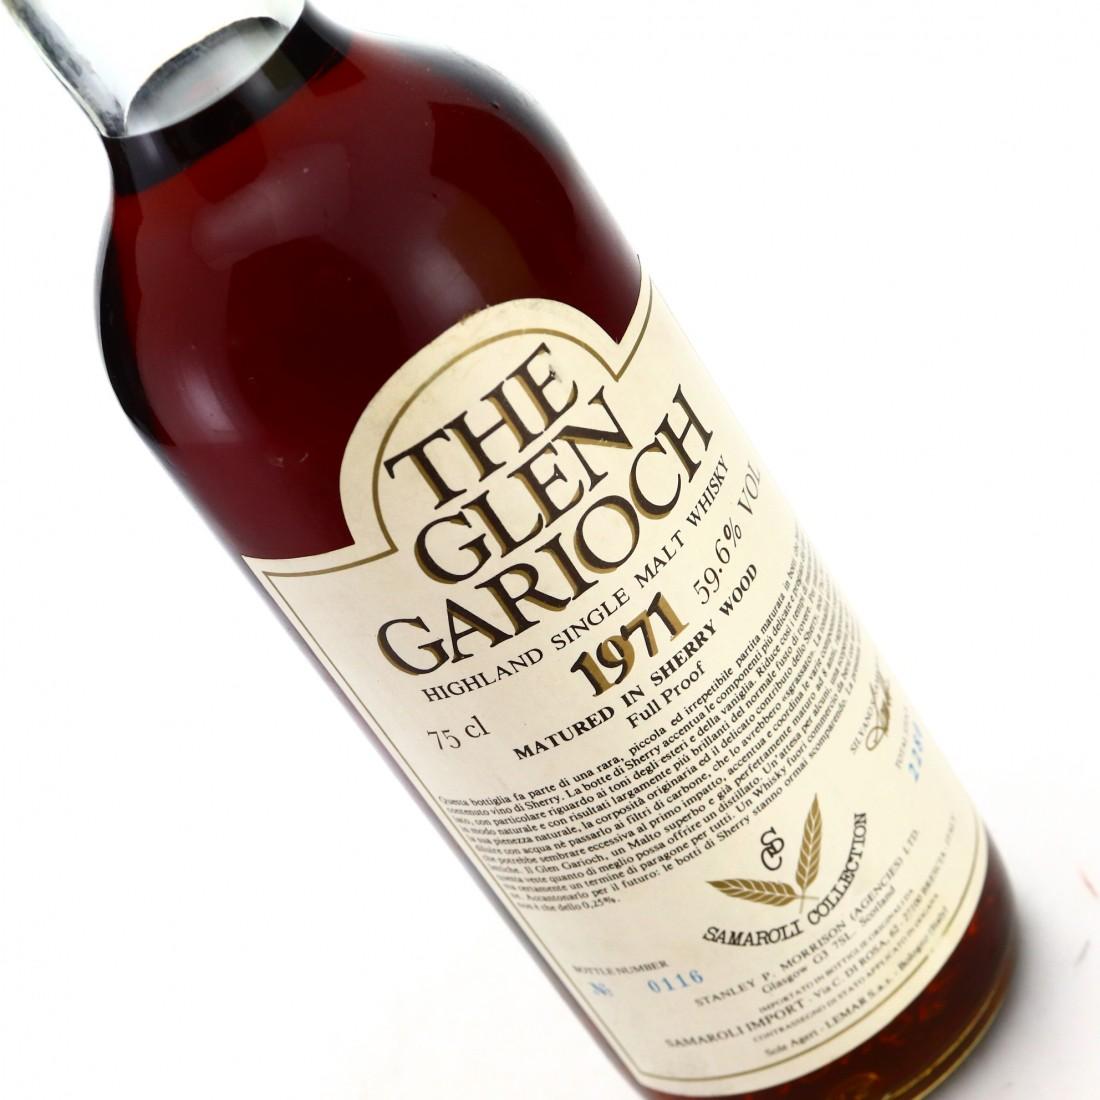 Glen Garioch 1971 Samaroli Collection Sherry Wood Full Proof